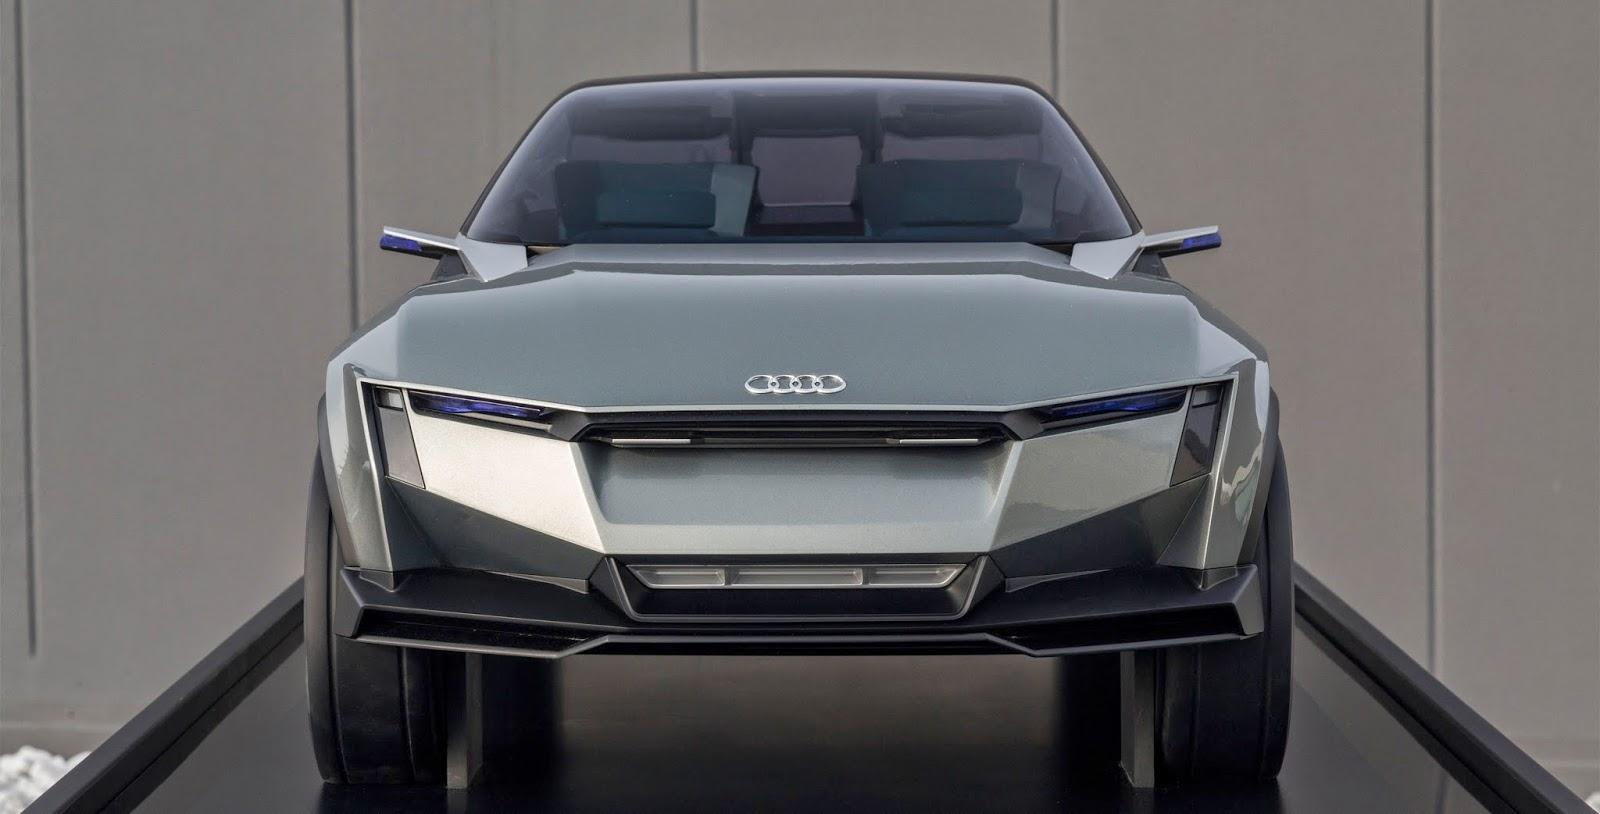 Ming S My Master Thesis Audi Autonomous Car For Geek